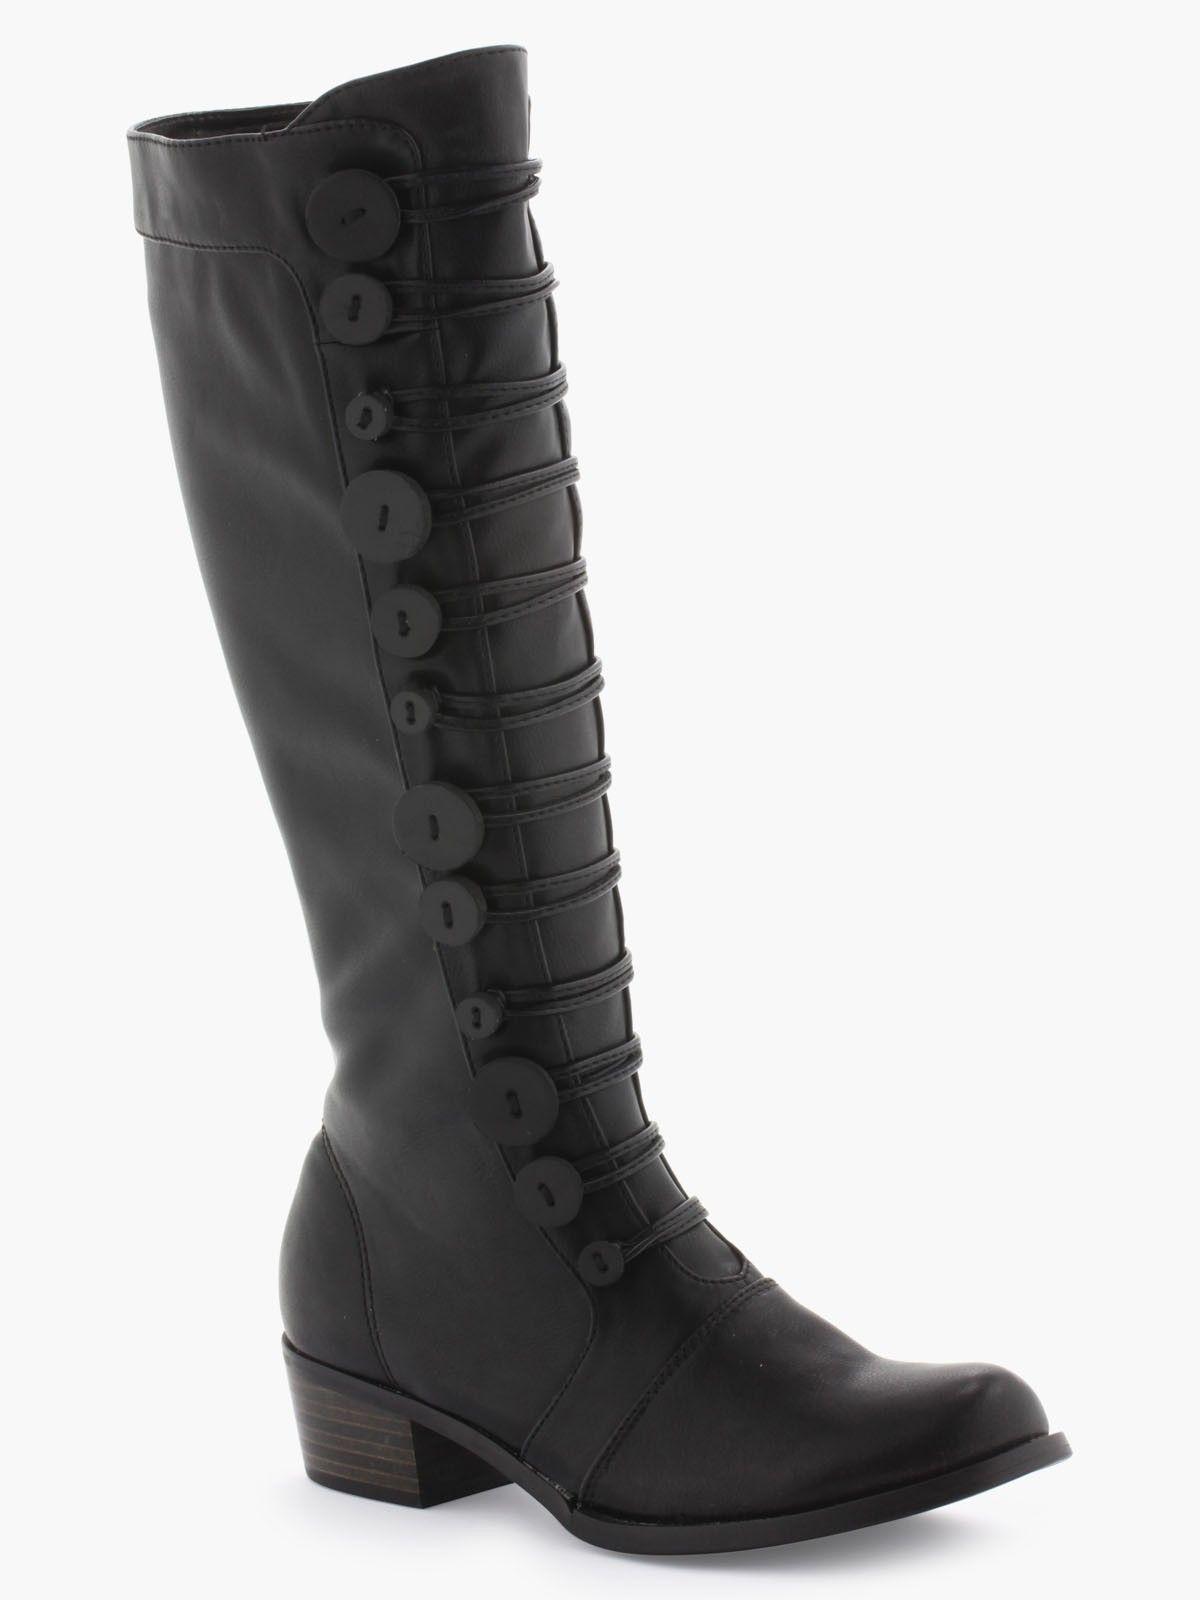 Ixoo Bottines La Halle Boots qVjLzMUGSp